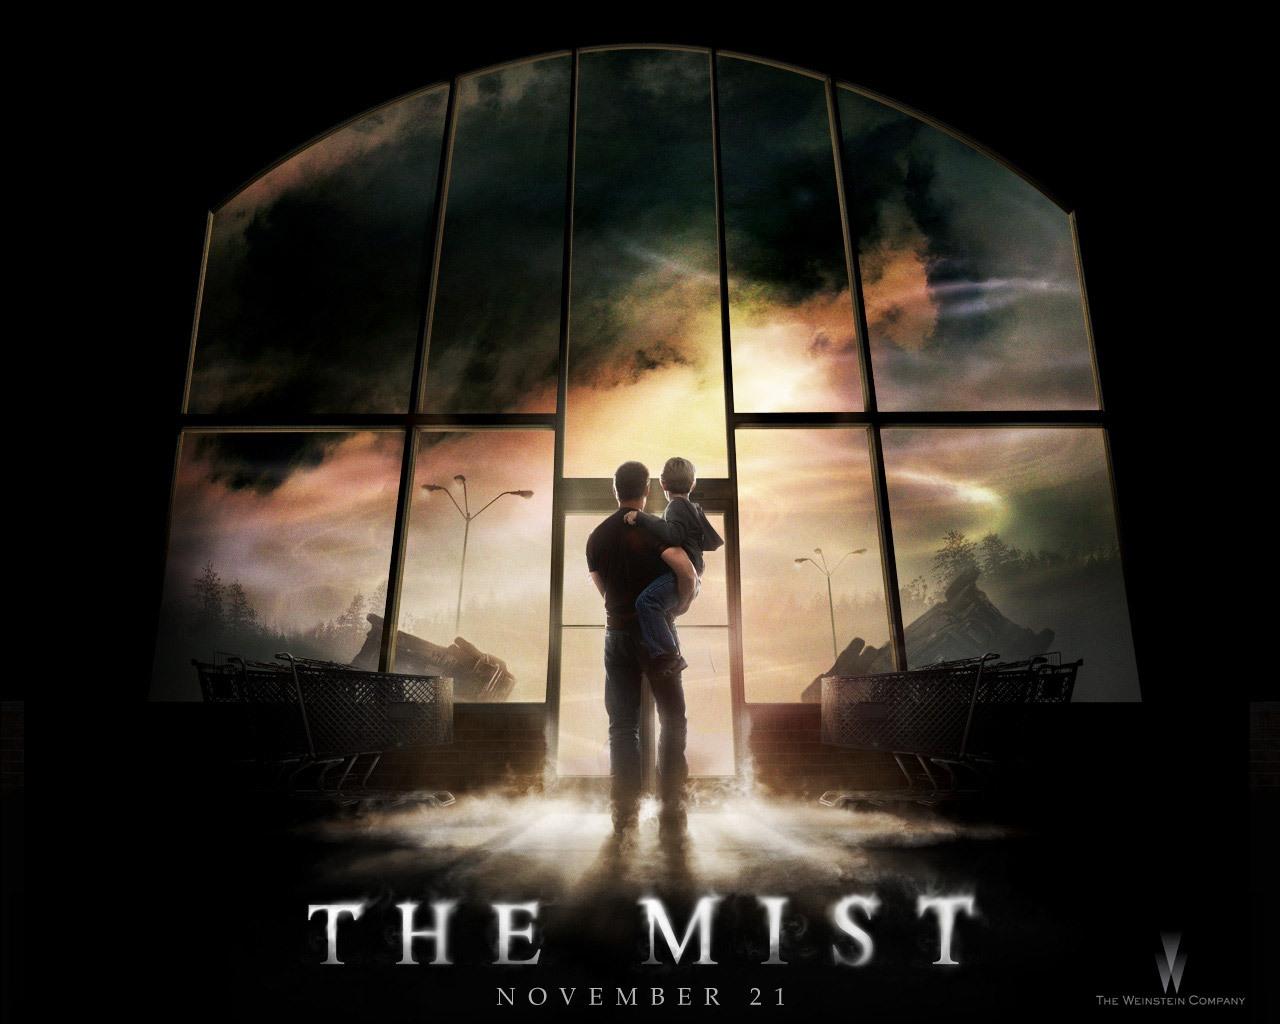 the-mist-2007